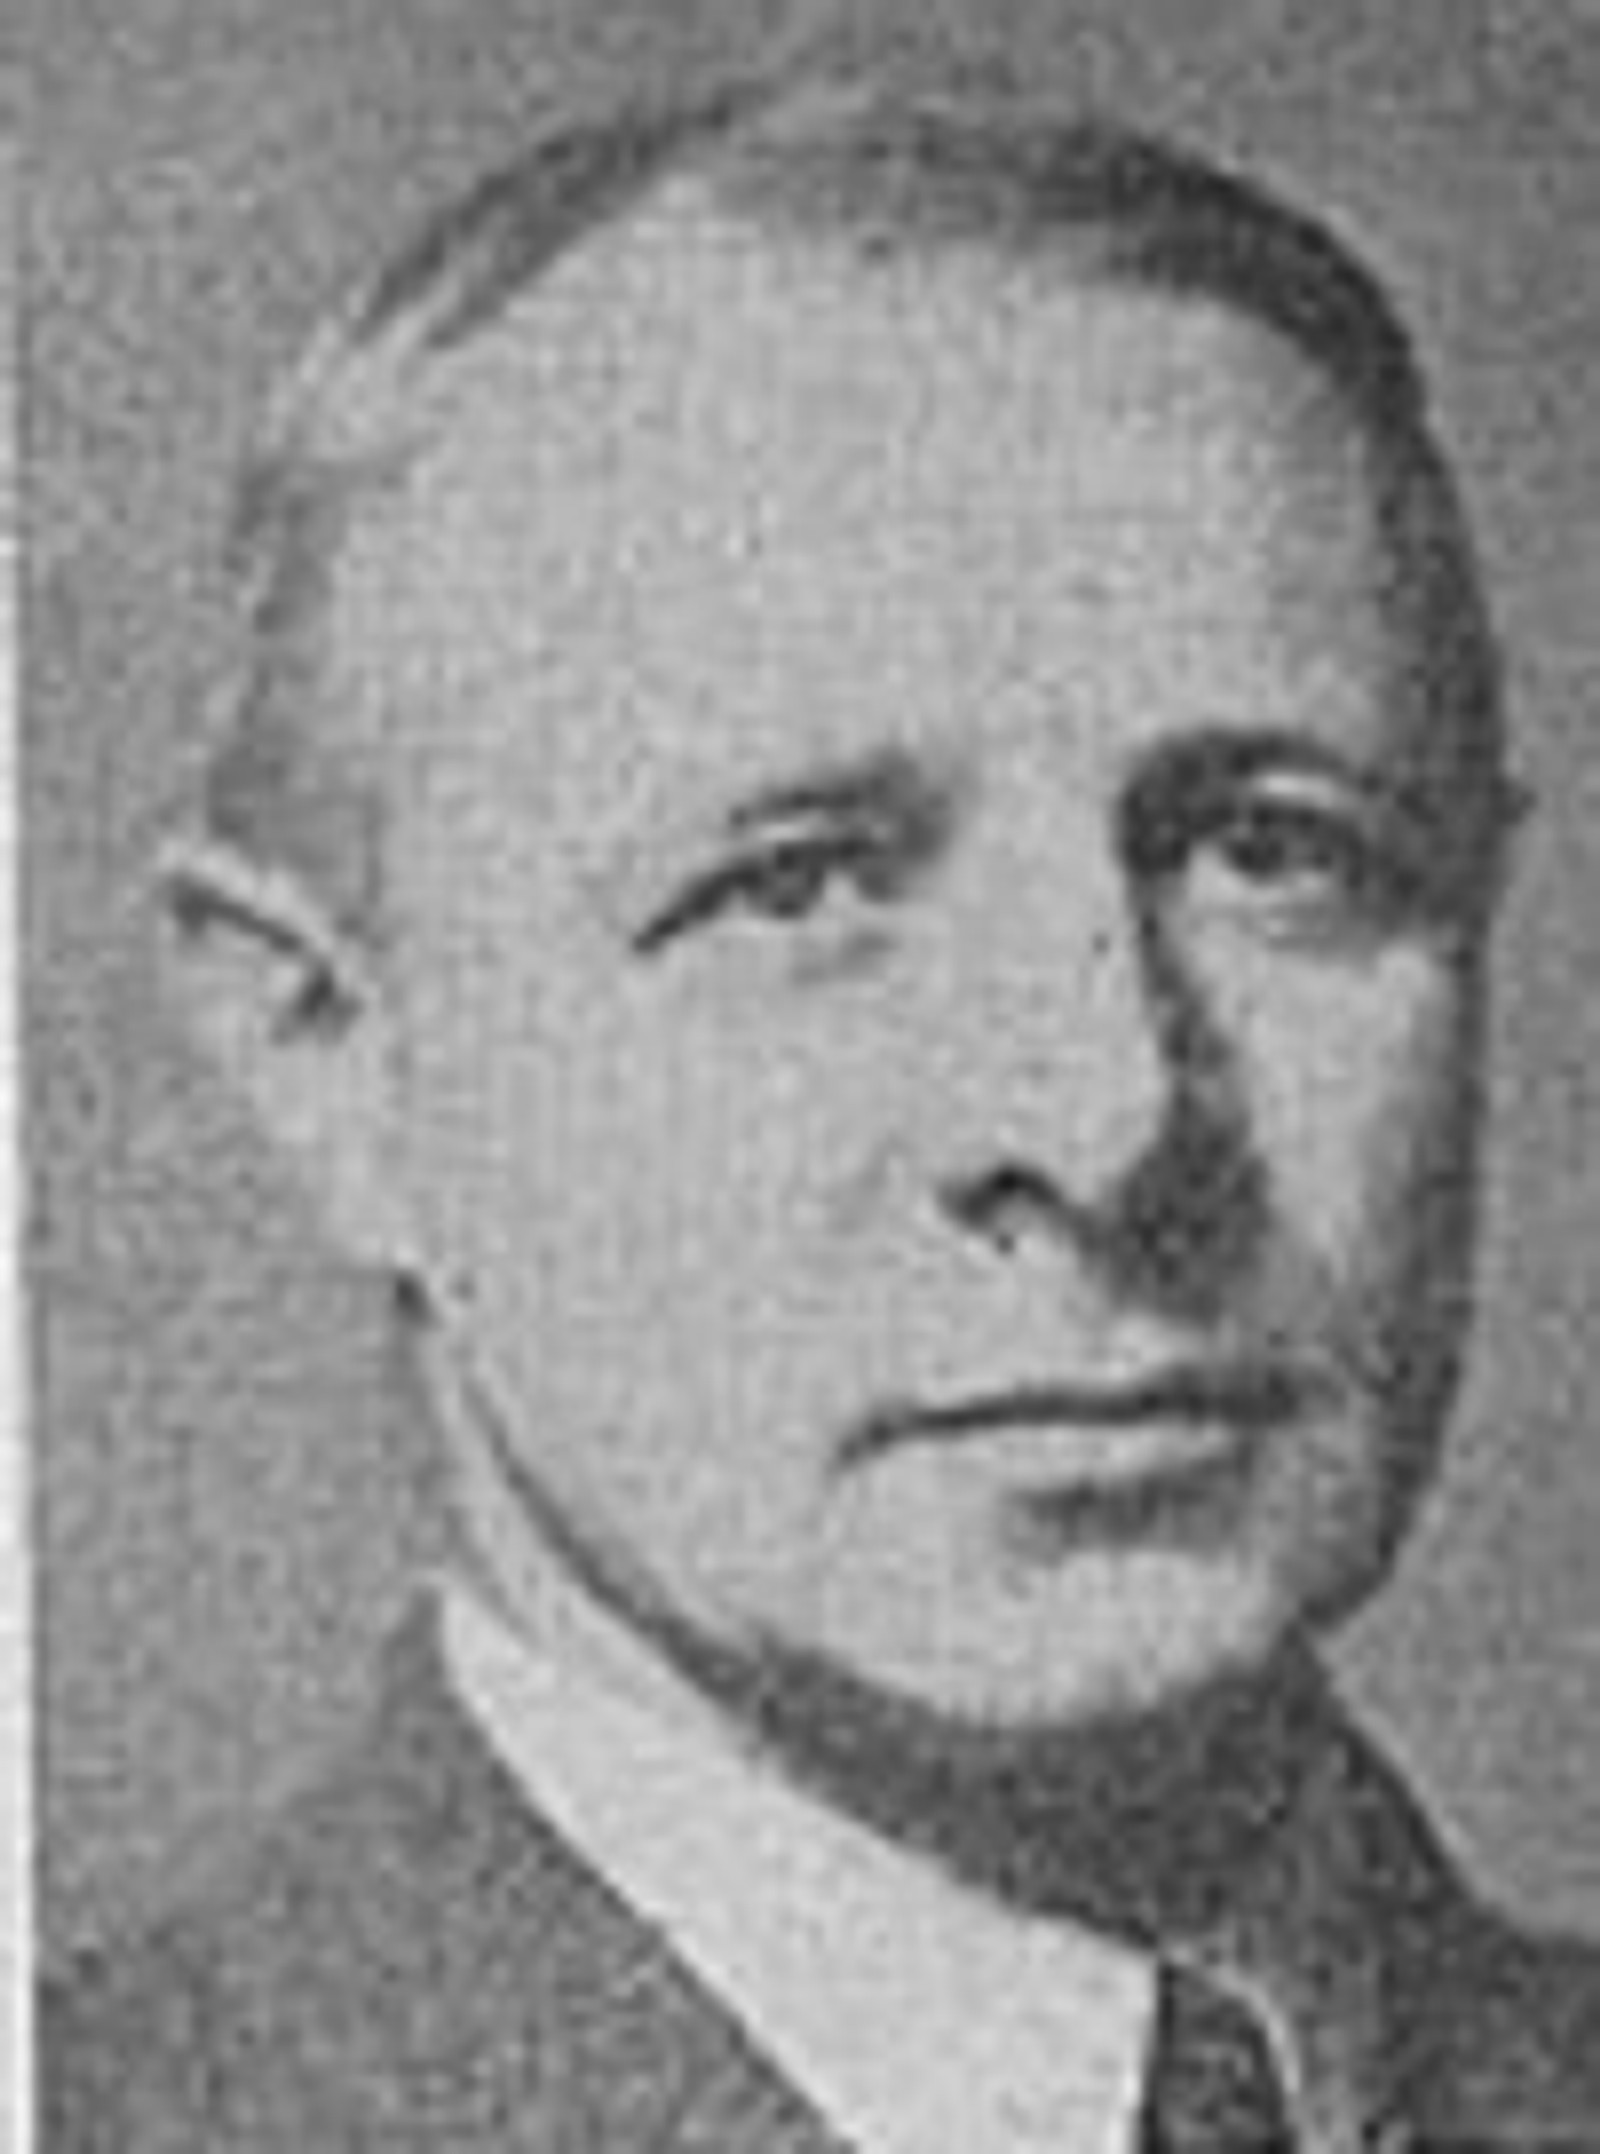 DØDE: Leiv Lea 1895-1942.